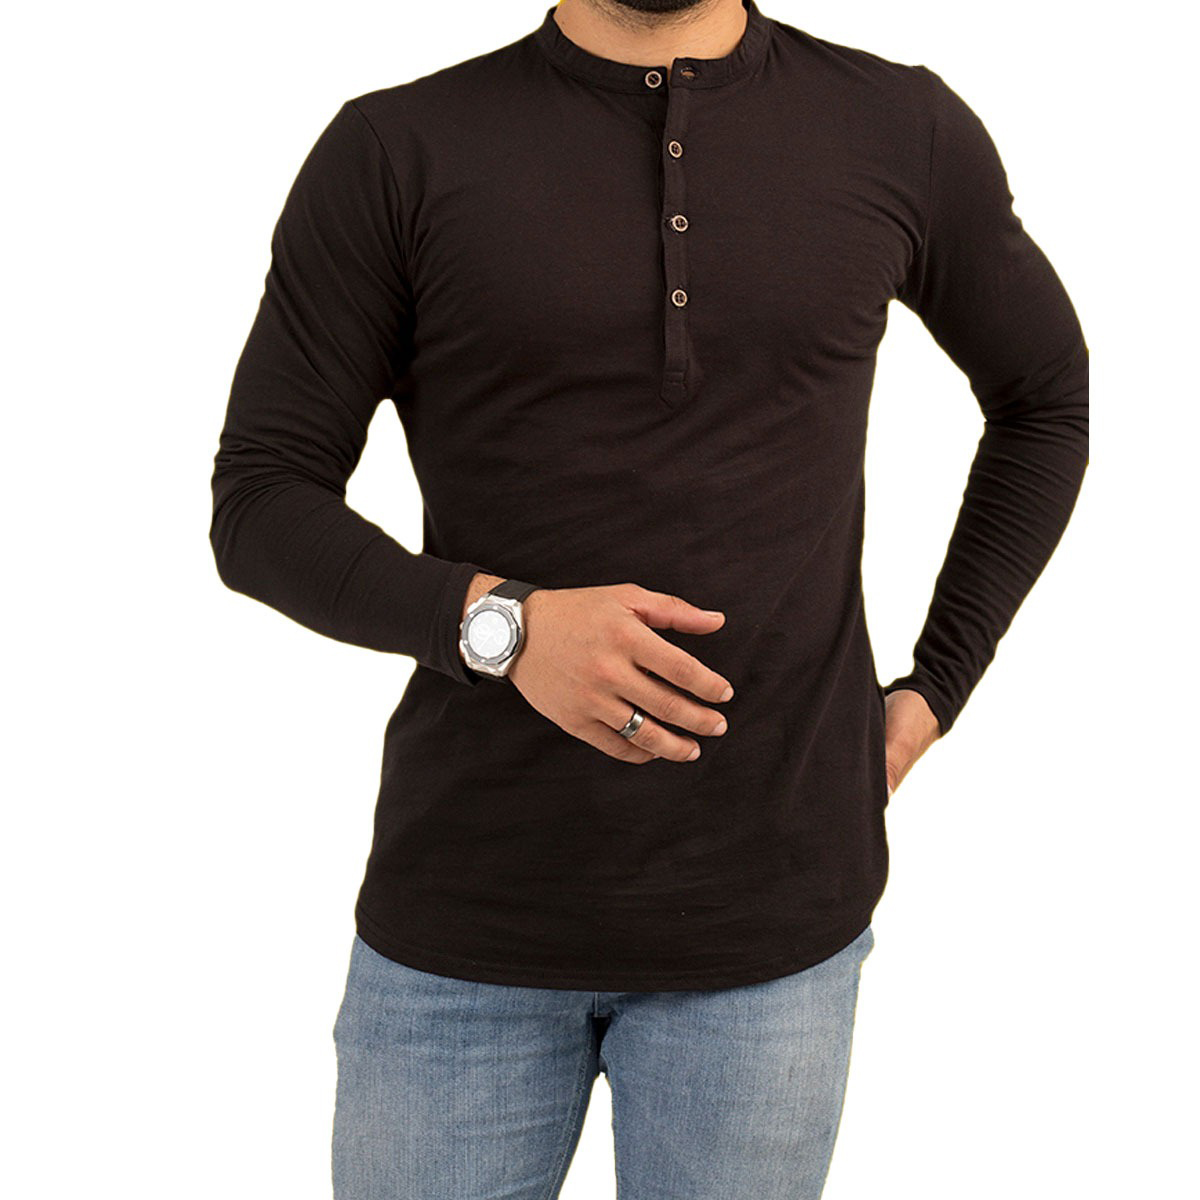 Pz Full Sleeves Black Plain Kurti Tshirt For Men